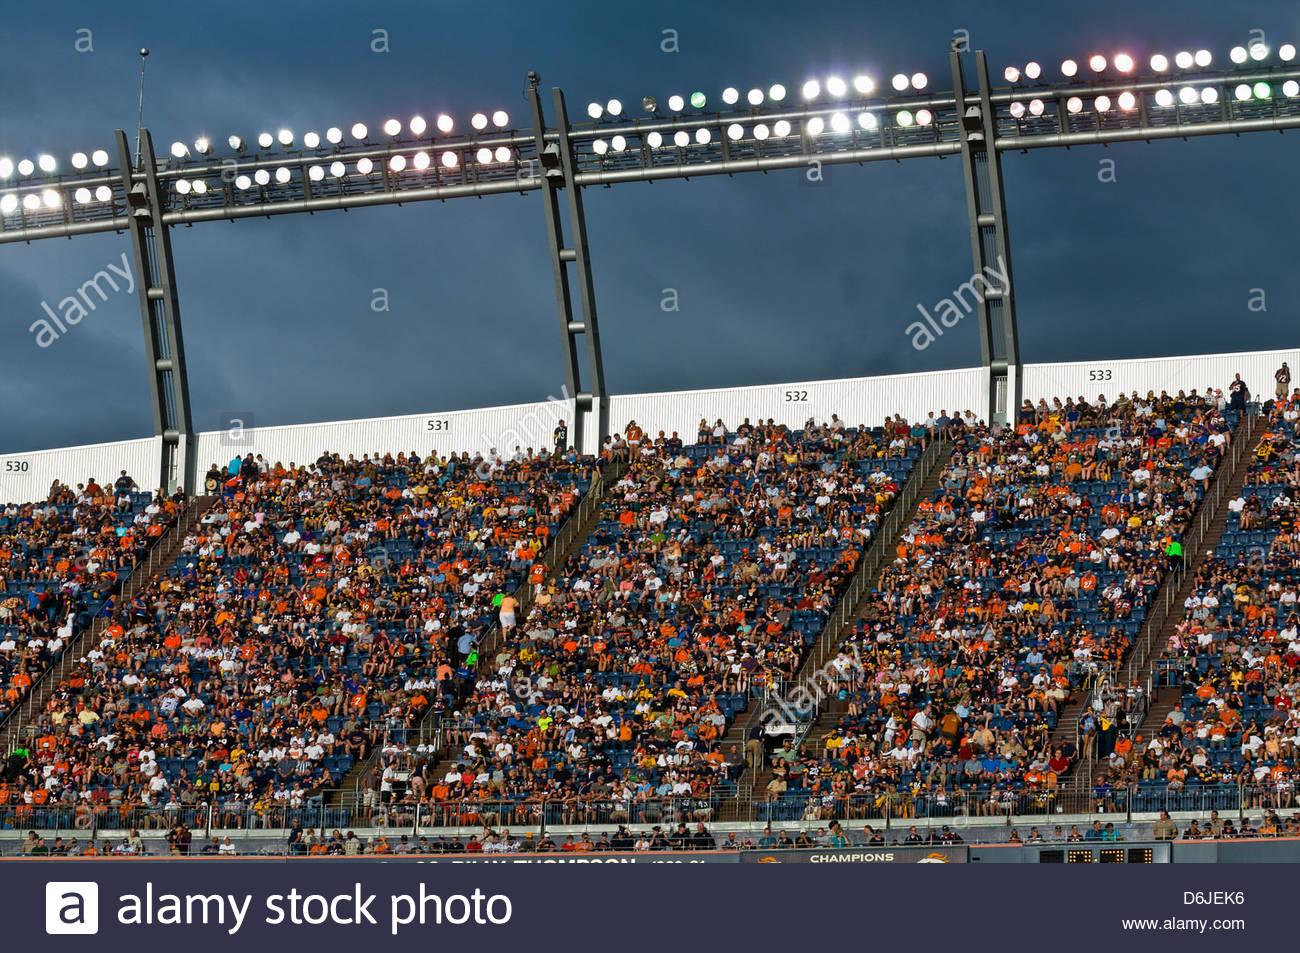 Denver Broncos vs. Pittsburgh Steelers NFL football game, Invesco Field at Mile High (stadium), Denver, Colorado - Stock Image